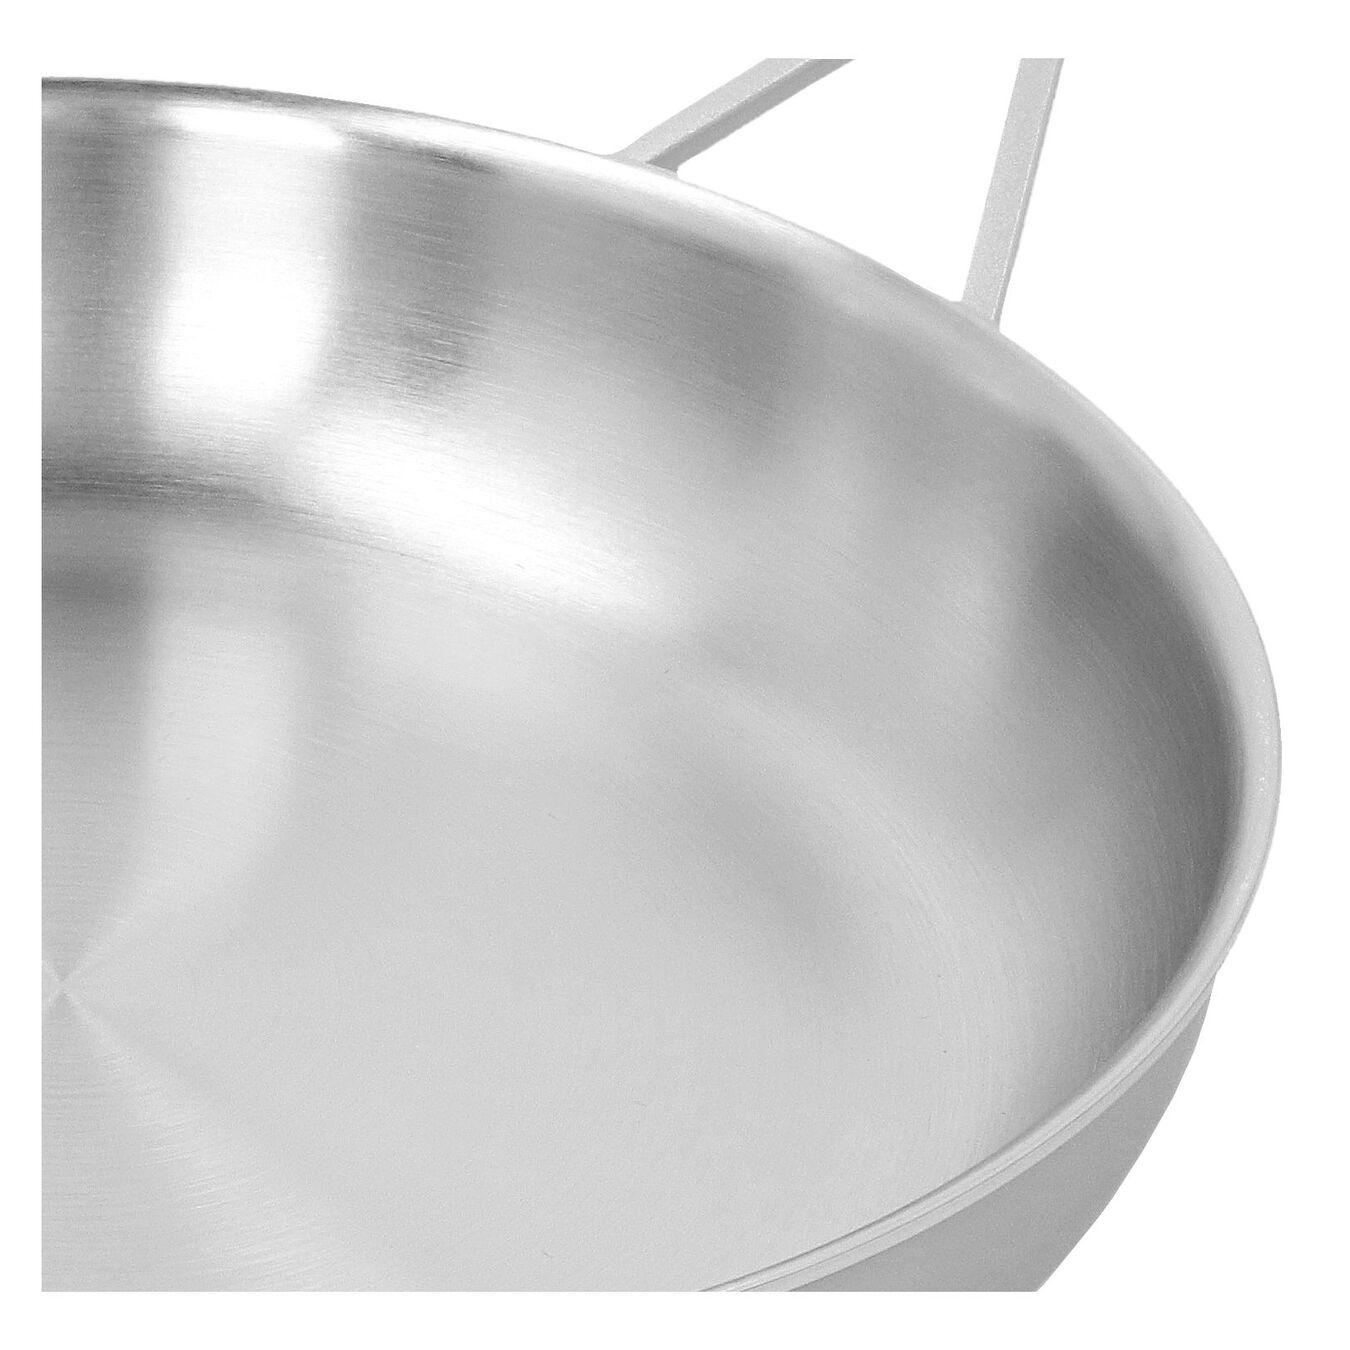 28 cm / 11 inch Frying pan,,large 4